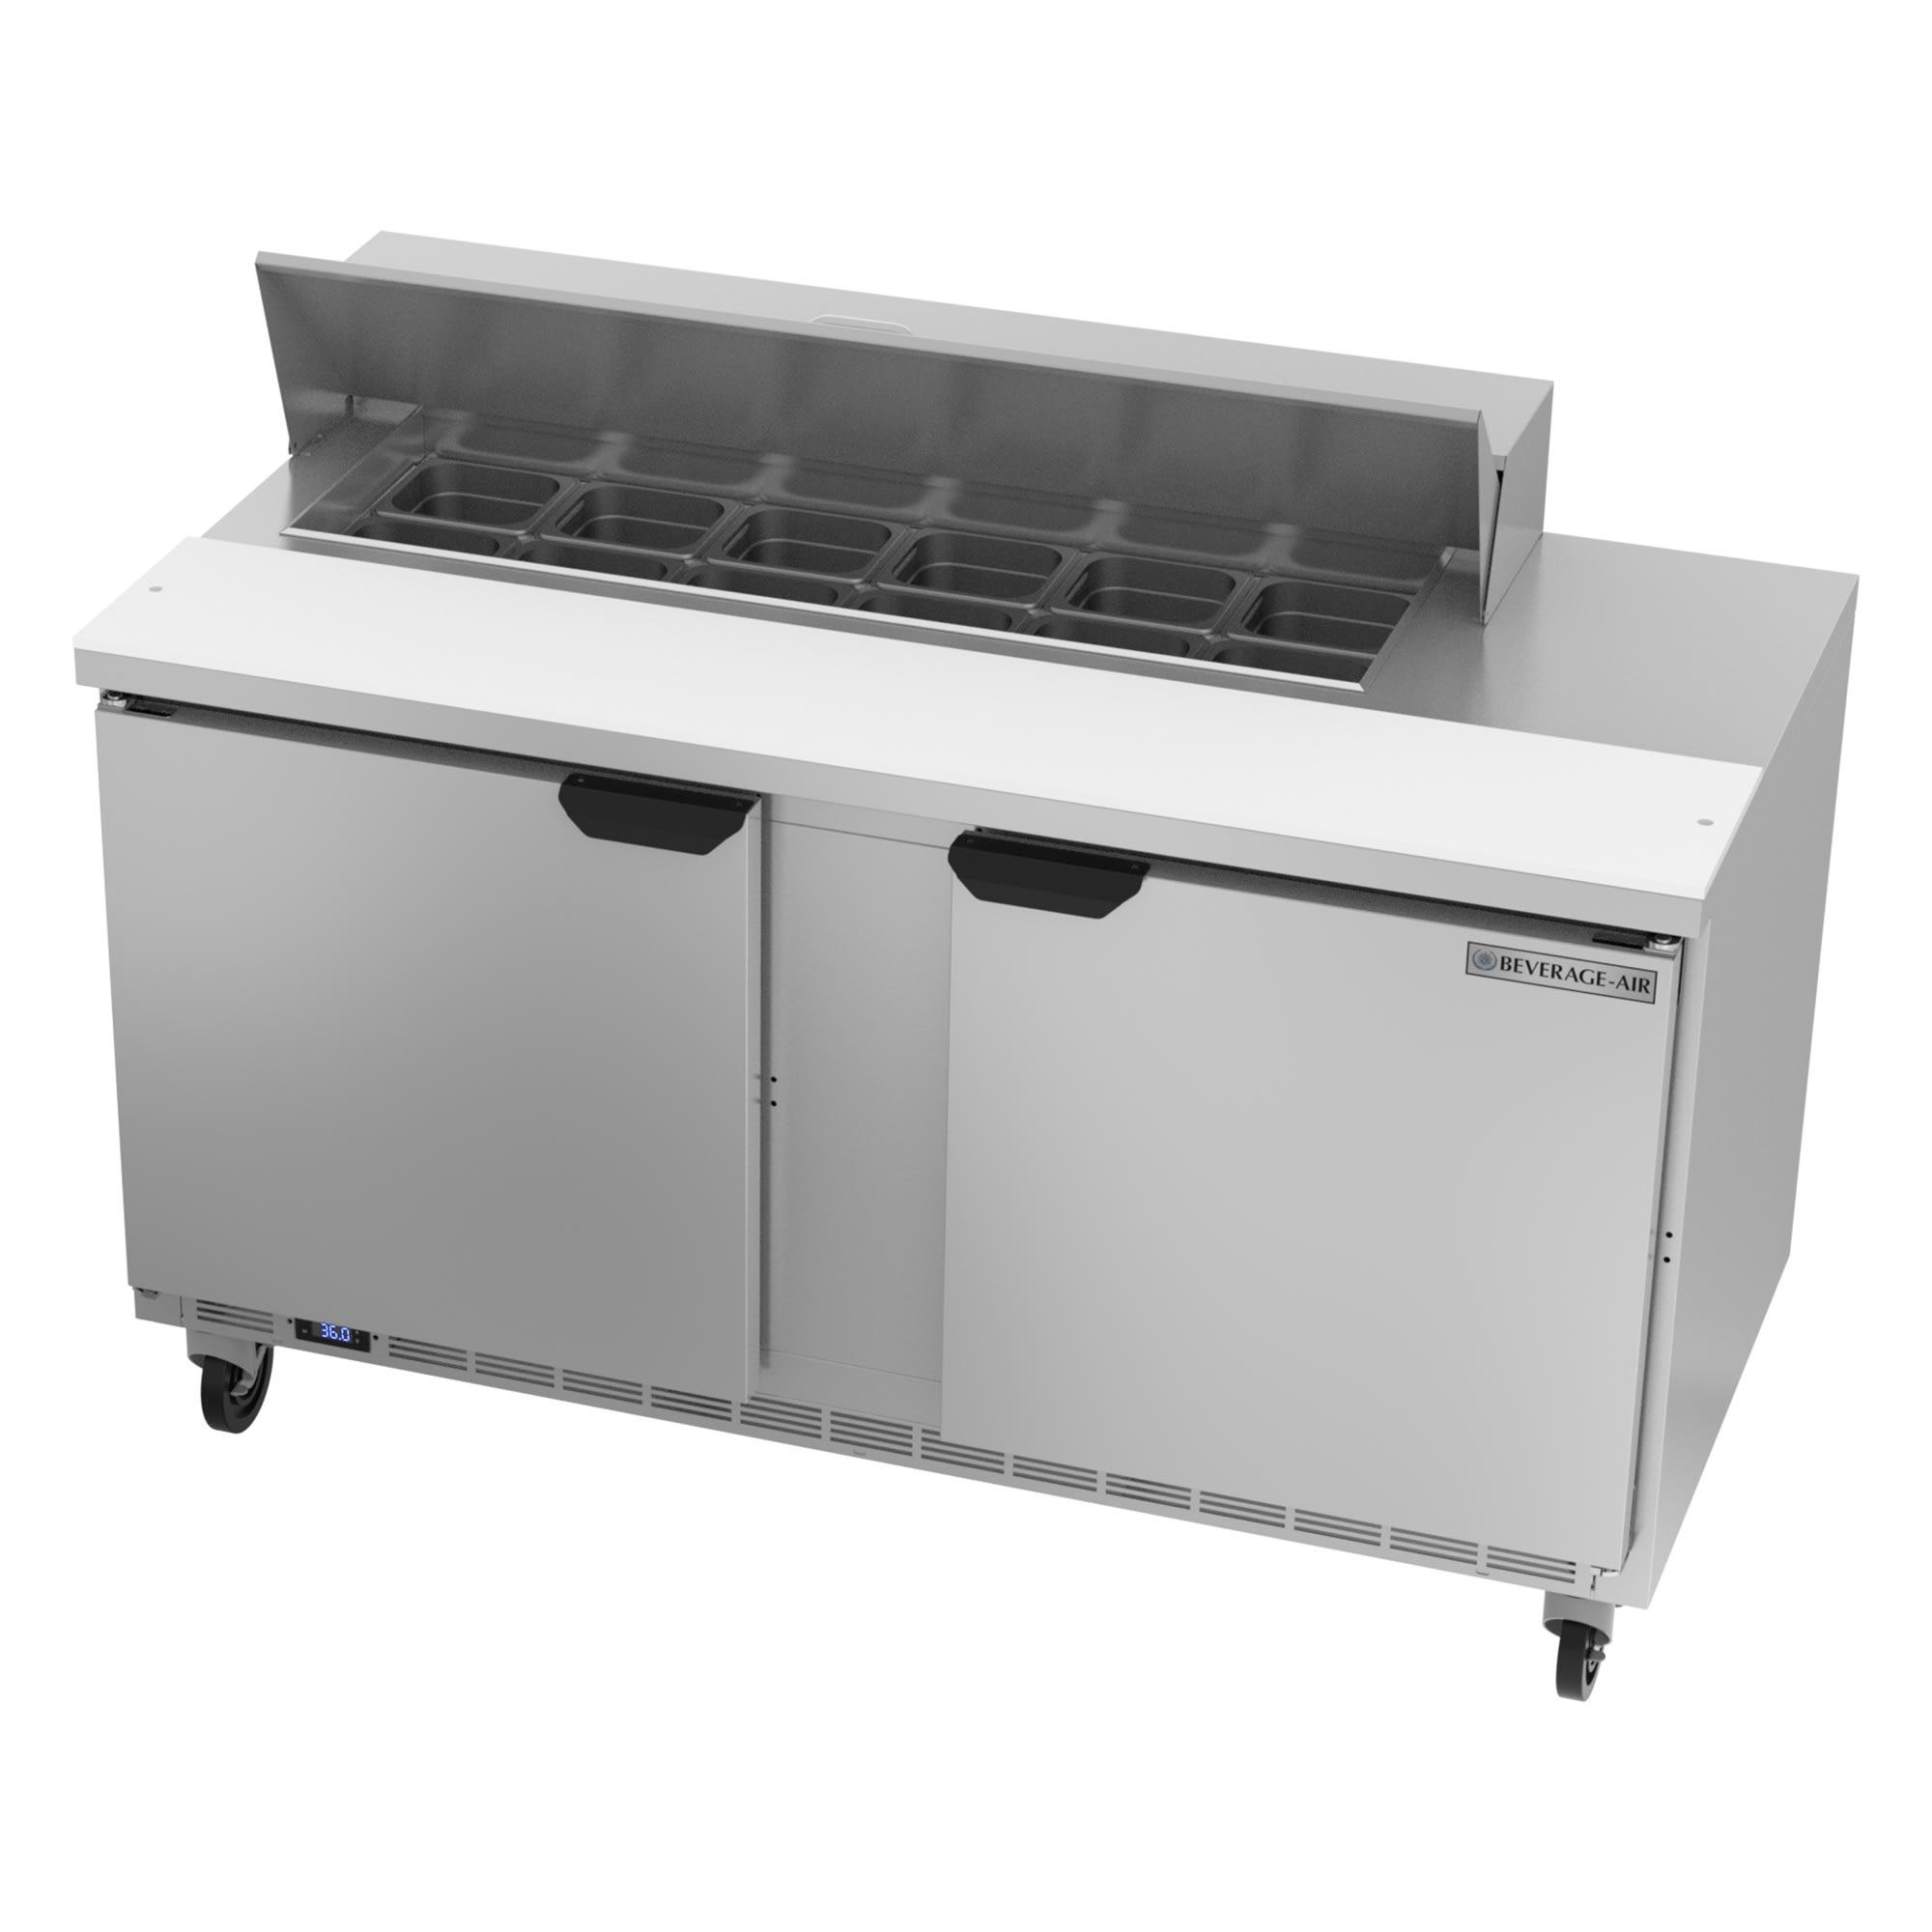 "Beverage Air SPE60HC-12 60"" Sandwich/Salad Prep Table w/ Refrigerated Base, 115v"